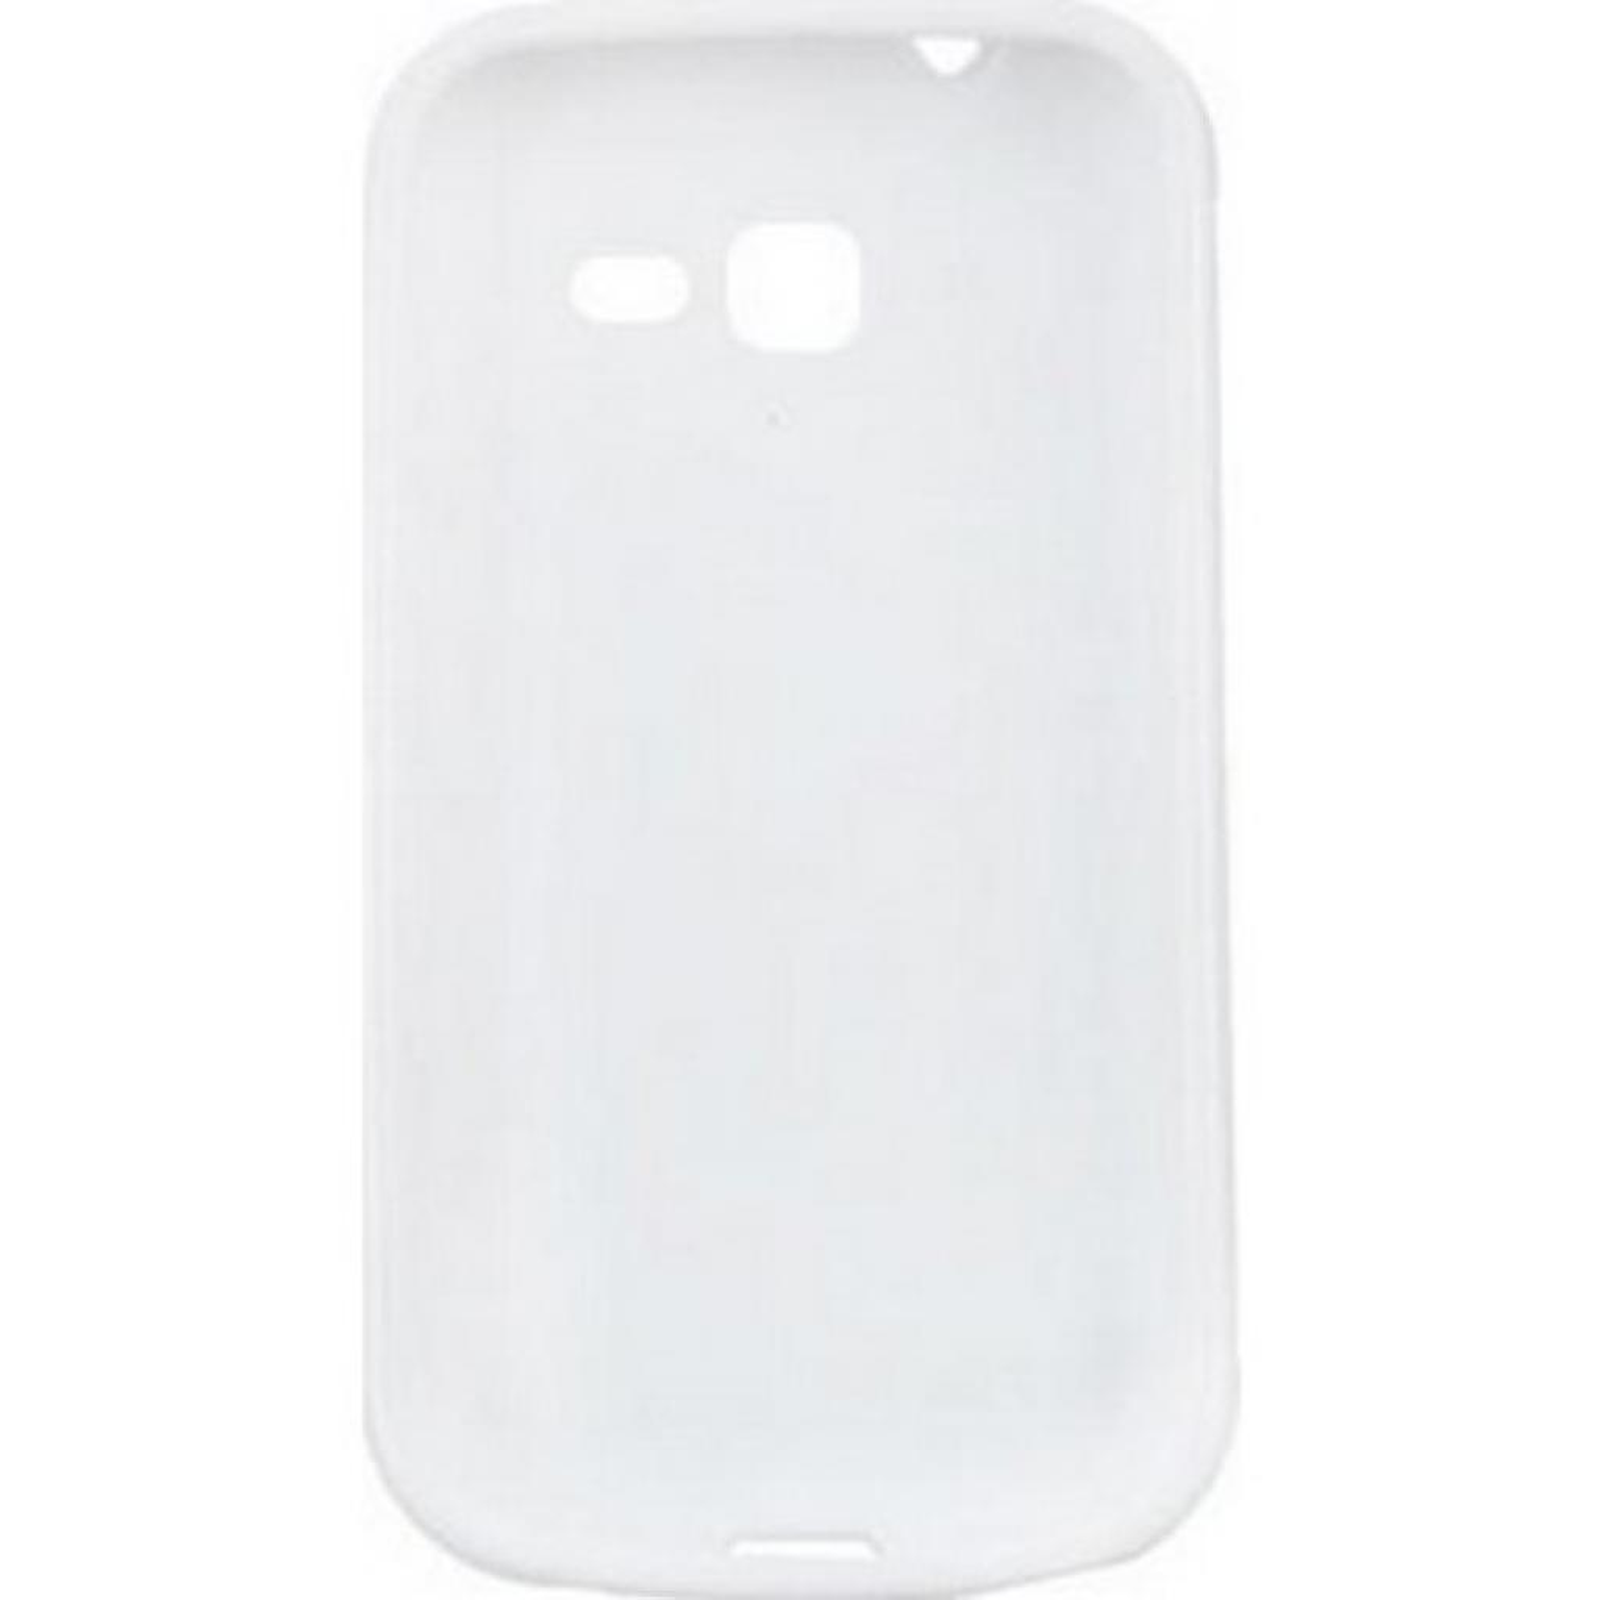 Чехол для моб. телефона для Samsung Galaxy Trend S7390 (White Сlear) Elastic PU Drobak (216082) изображение 2